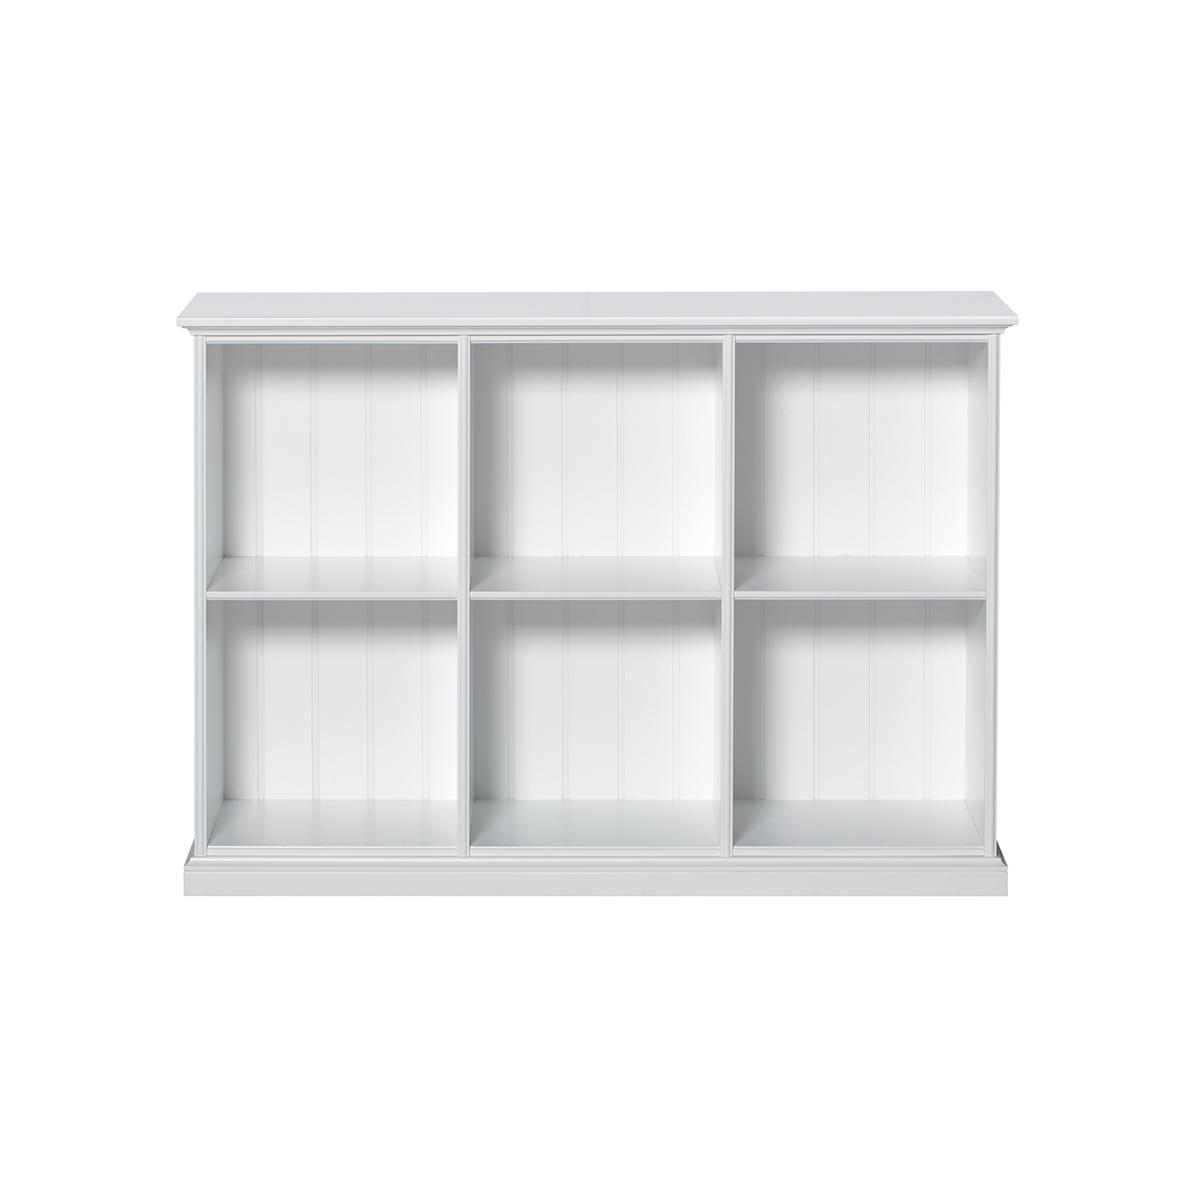 Bibliothèque 6 compartiments SEASIDE Oliver Furniture blanc